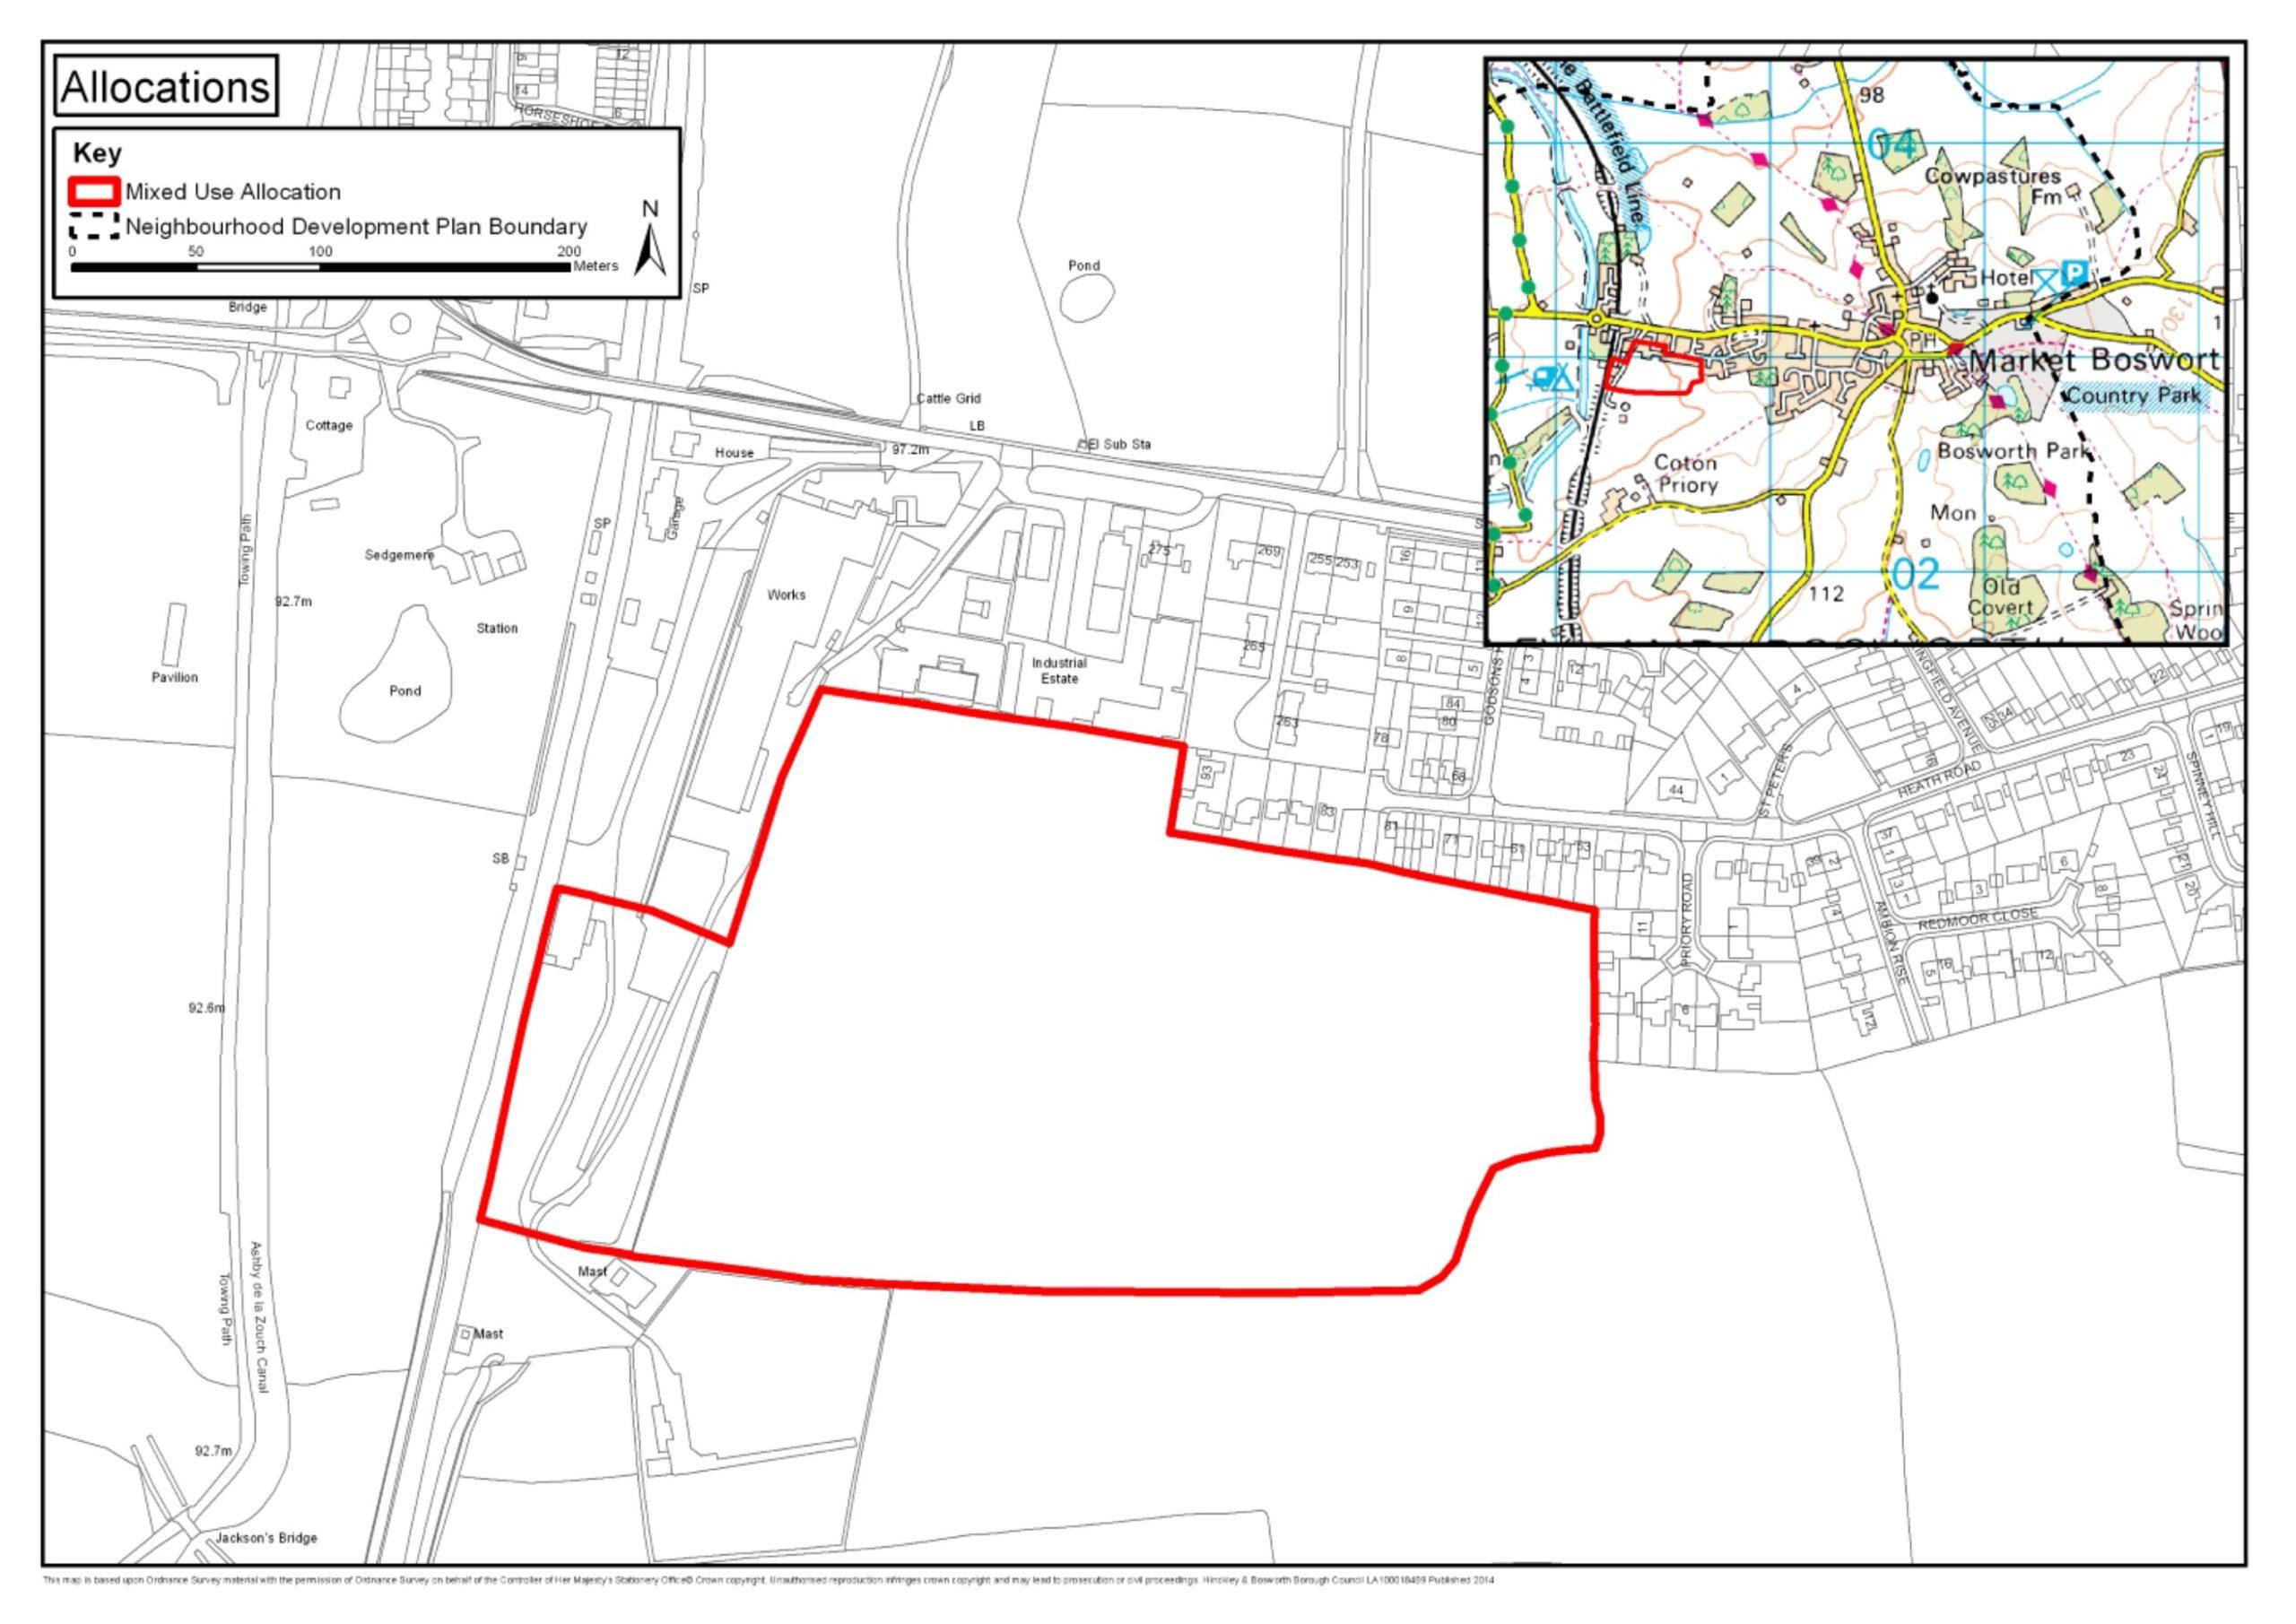 Allocated Site Location Map